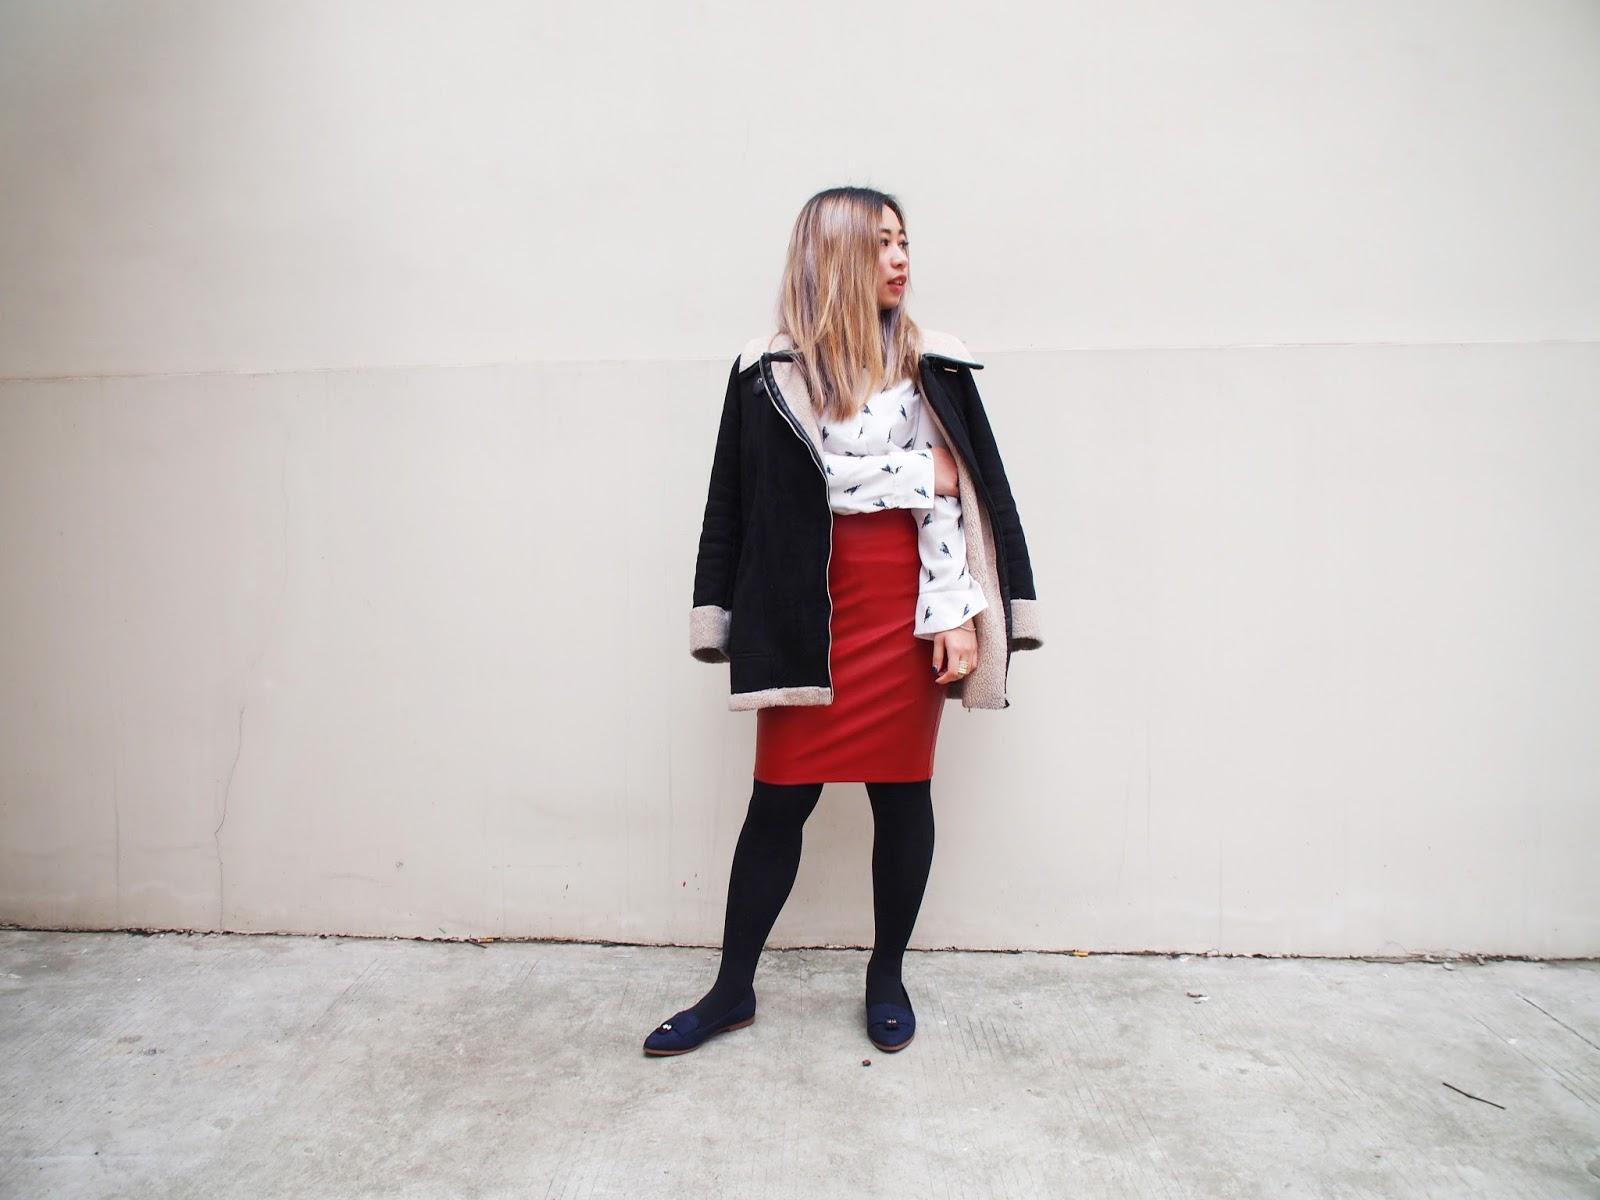 This is a photo of styling a Zara Shearling Coat + Business Look by Sidney Scarlett from www.sidneyscarlett.com